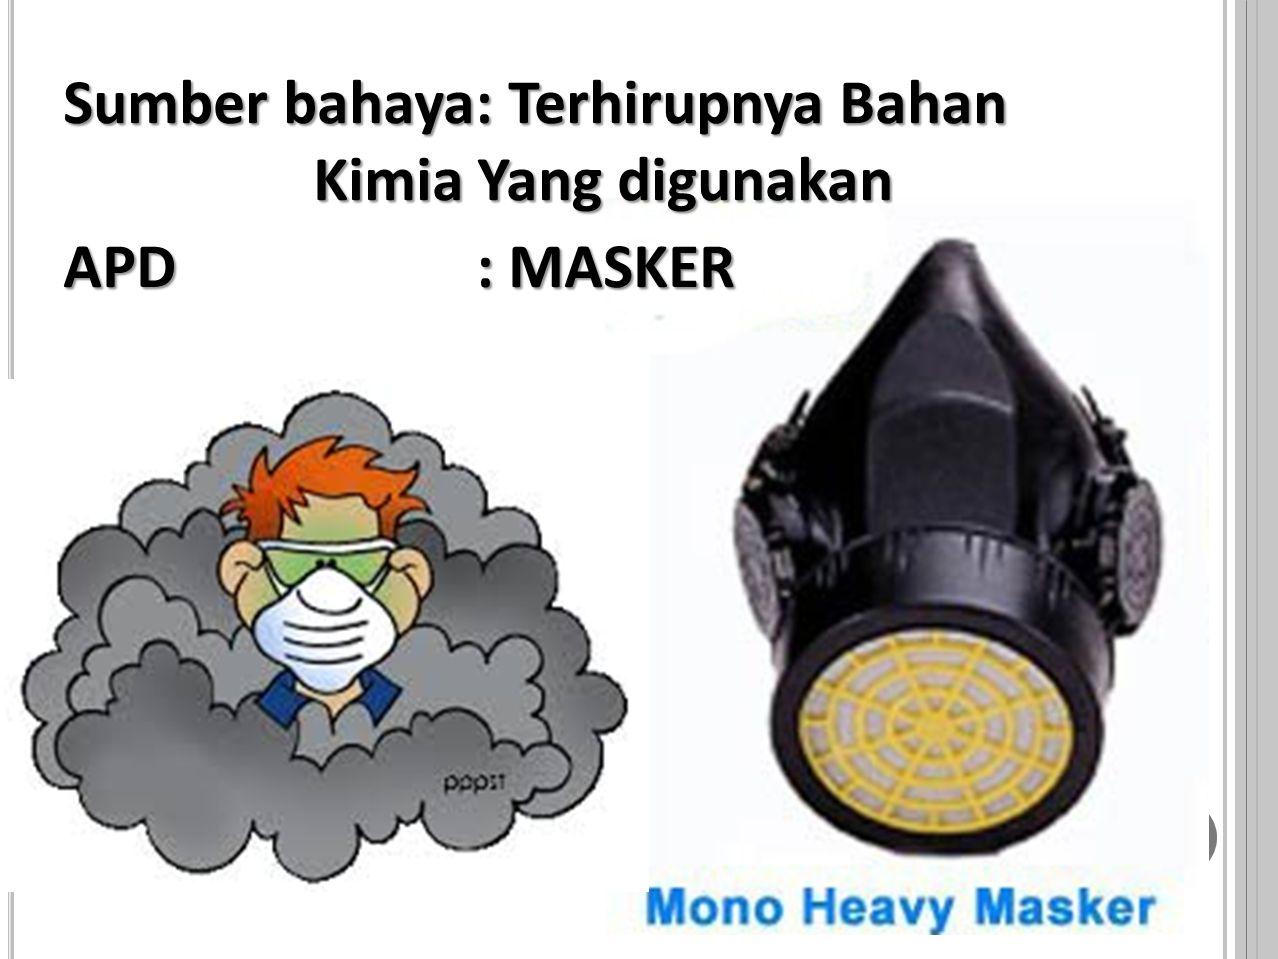 Sumber bahaya: Terkena Tumpahan Bahan Kimia tsb. APD: SARUNG TANGAN (GLOVES)DAN SEPATU